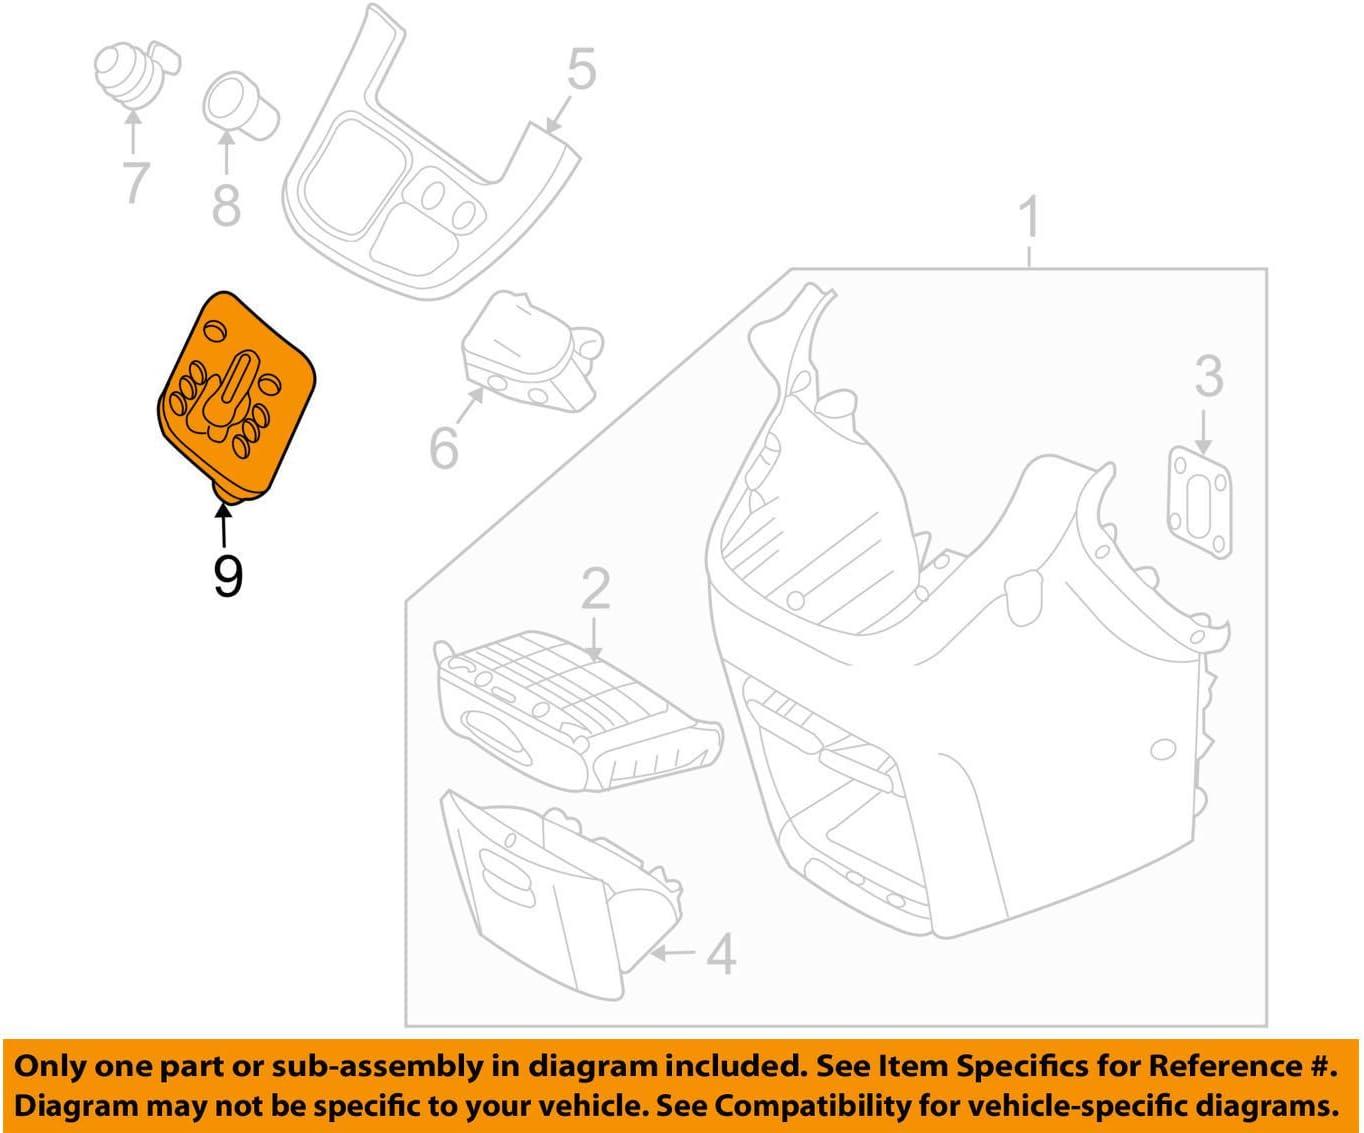 Genuine Hyundai 46750-4D300 Shift Lever Indicator Assembly